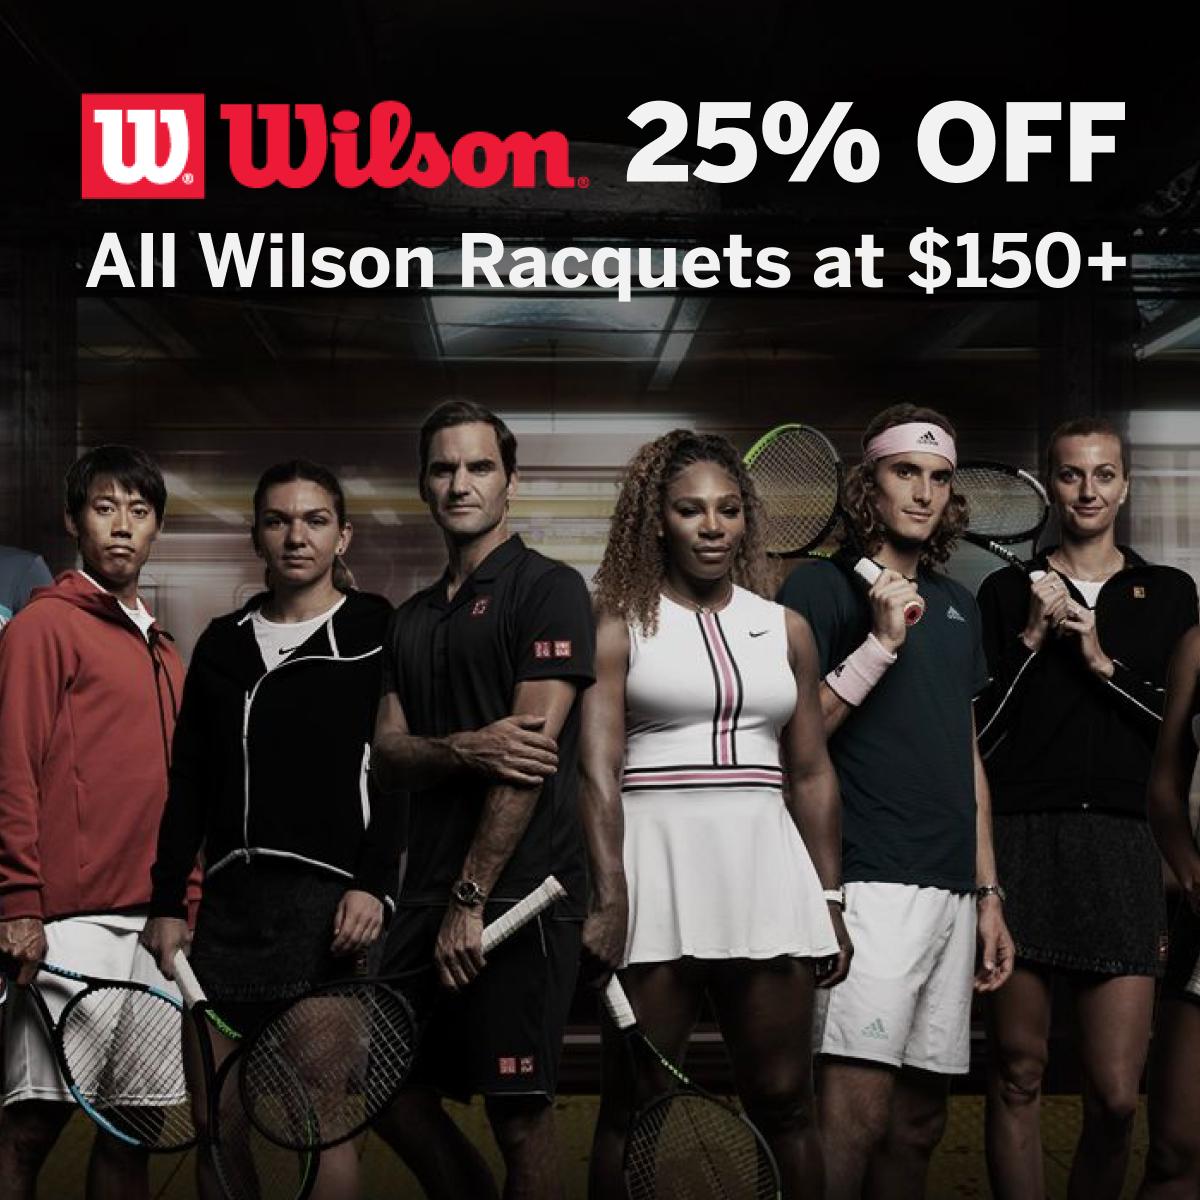 Wilson Racquets & Bags